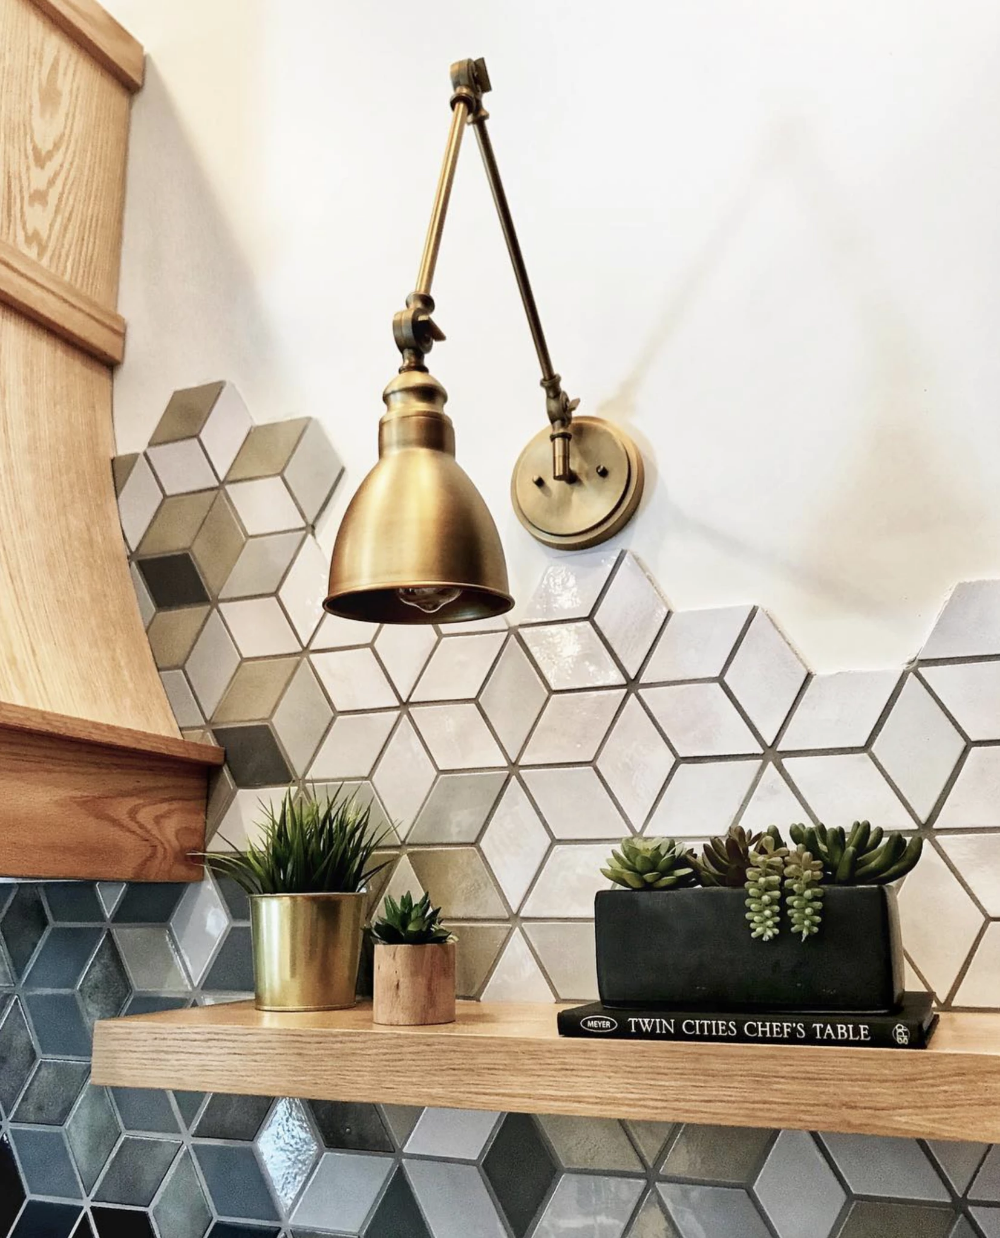 Creative Tile Finishing Ideas With Organic Edging Unique Kitchen Backsplash Creative Tile Tile To Wood Transition